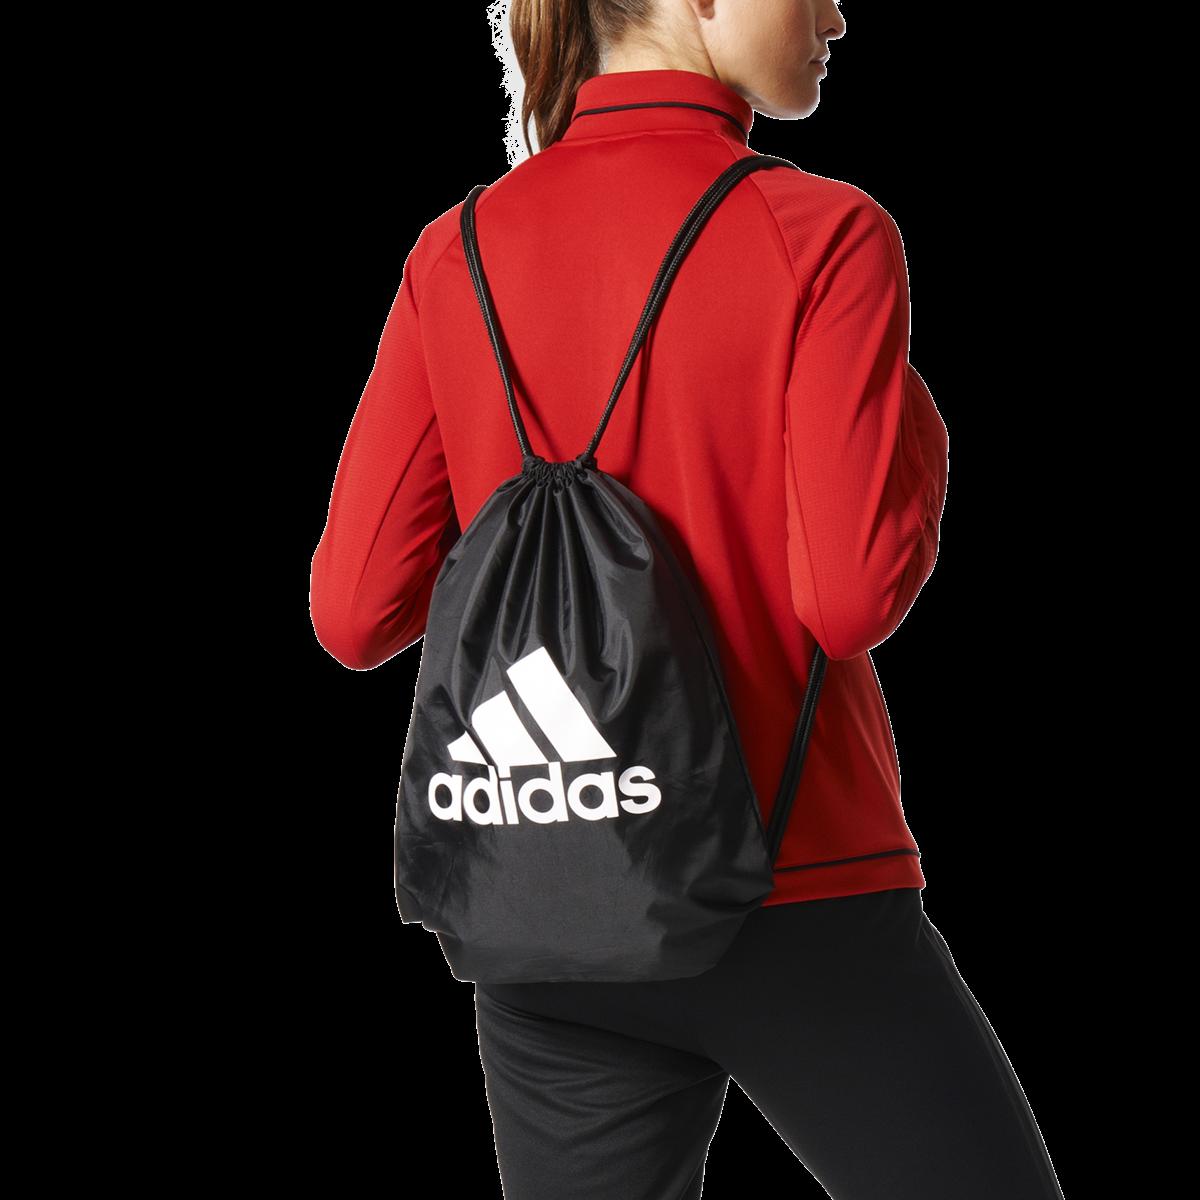 287d43962a036 ... Plecak VANS Realm Backpack - VN0A3UI6BLK + Worek Torba Adidas Tiro Gym  Bag - B46131 Kliknij, aby powiększyć ...